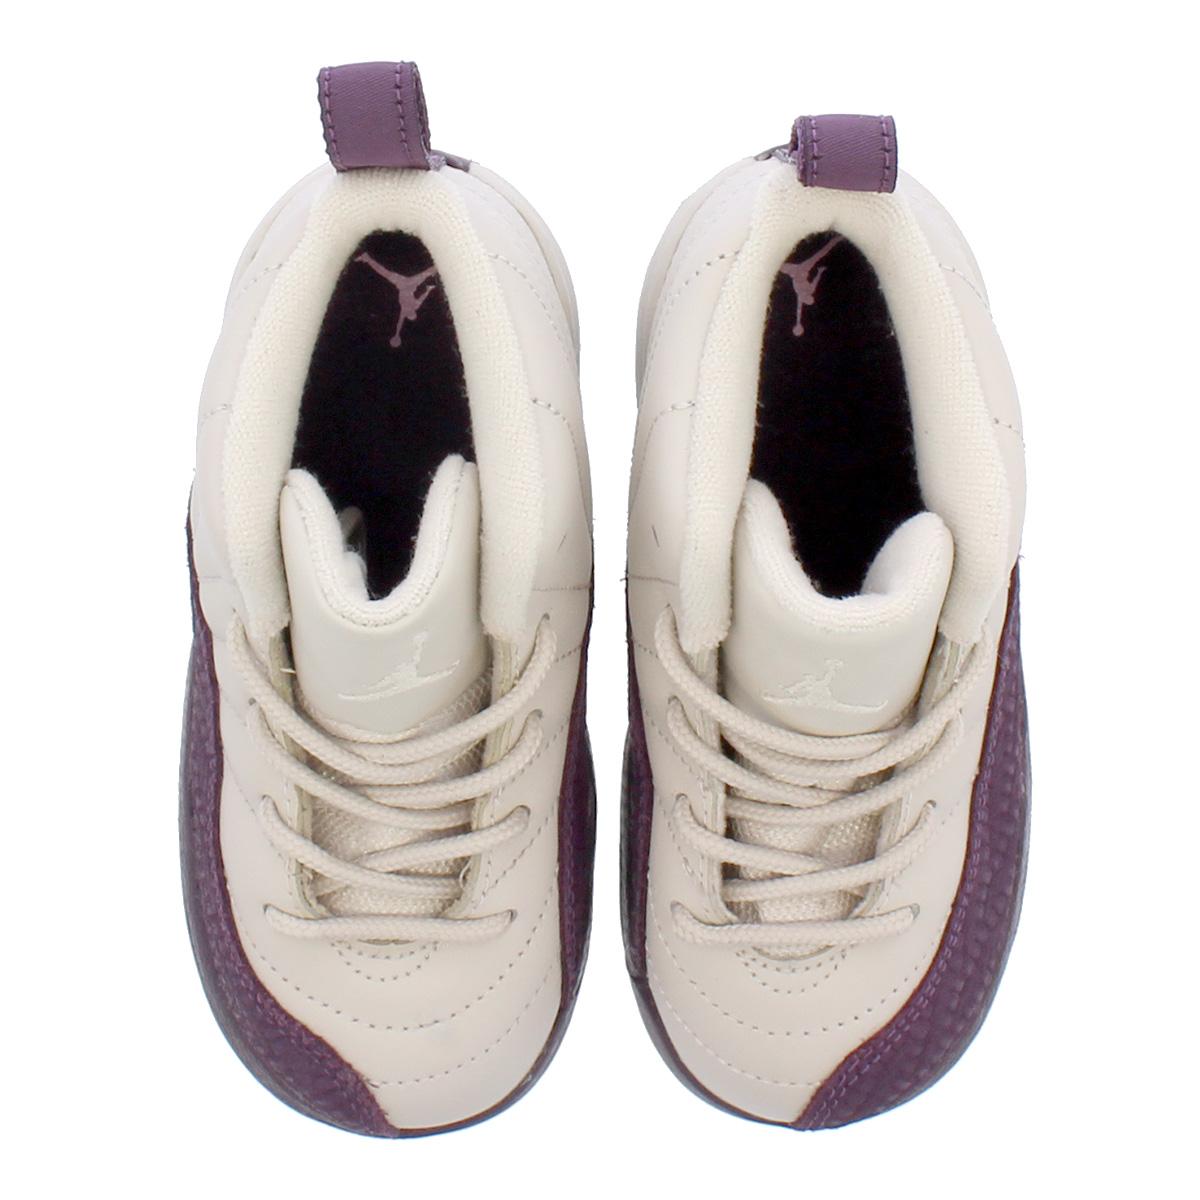 info for dab15 59aa9 NIKE AIR JORDAN 12 RETRO TD Nike Air Jordan 12 nostalgic TD DESERT  SAND/DESERT SAND/PRO PURPLE 819,666-001